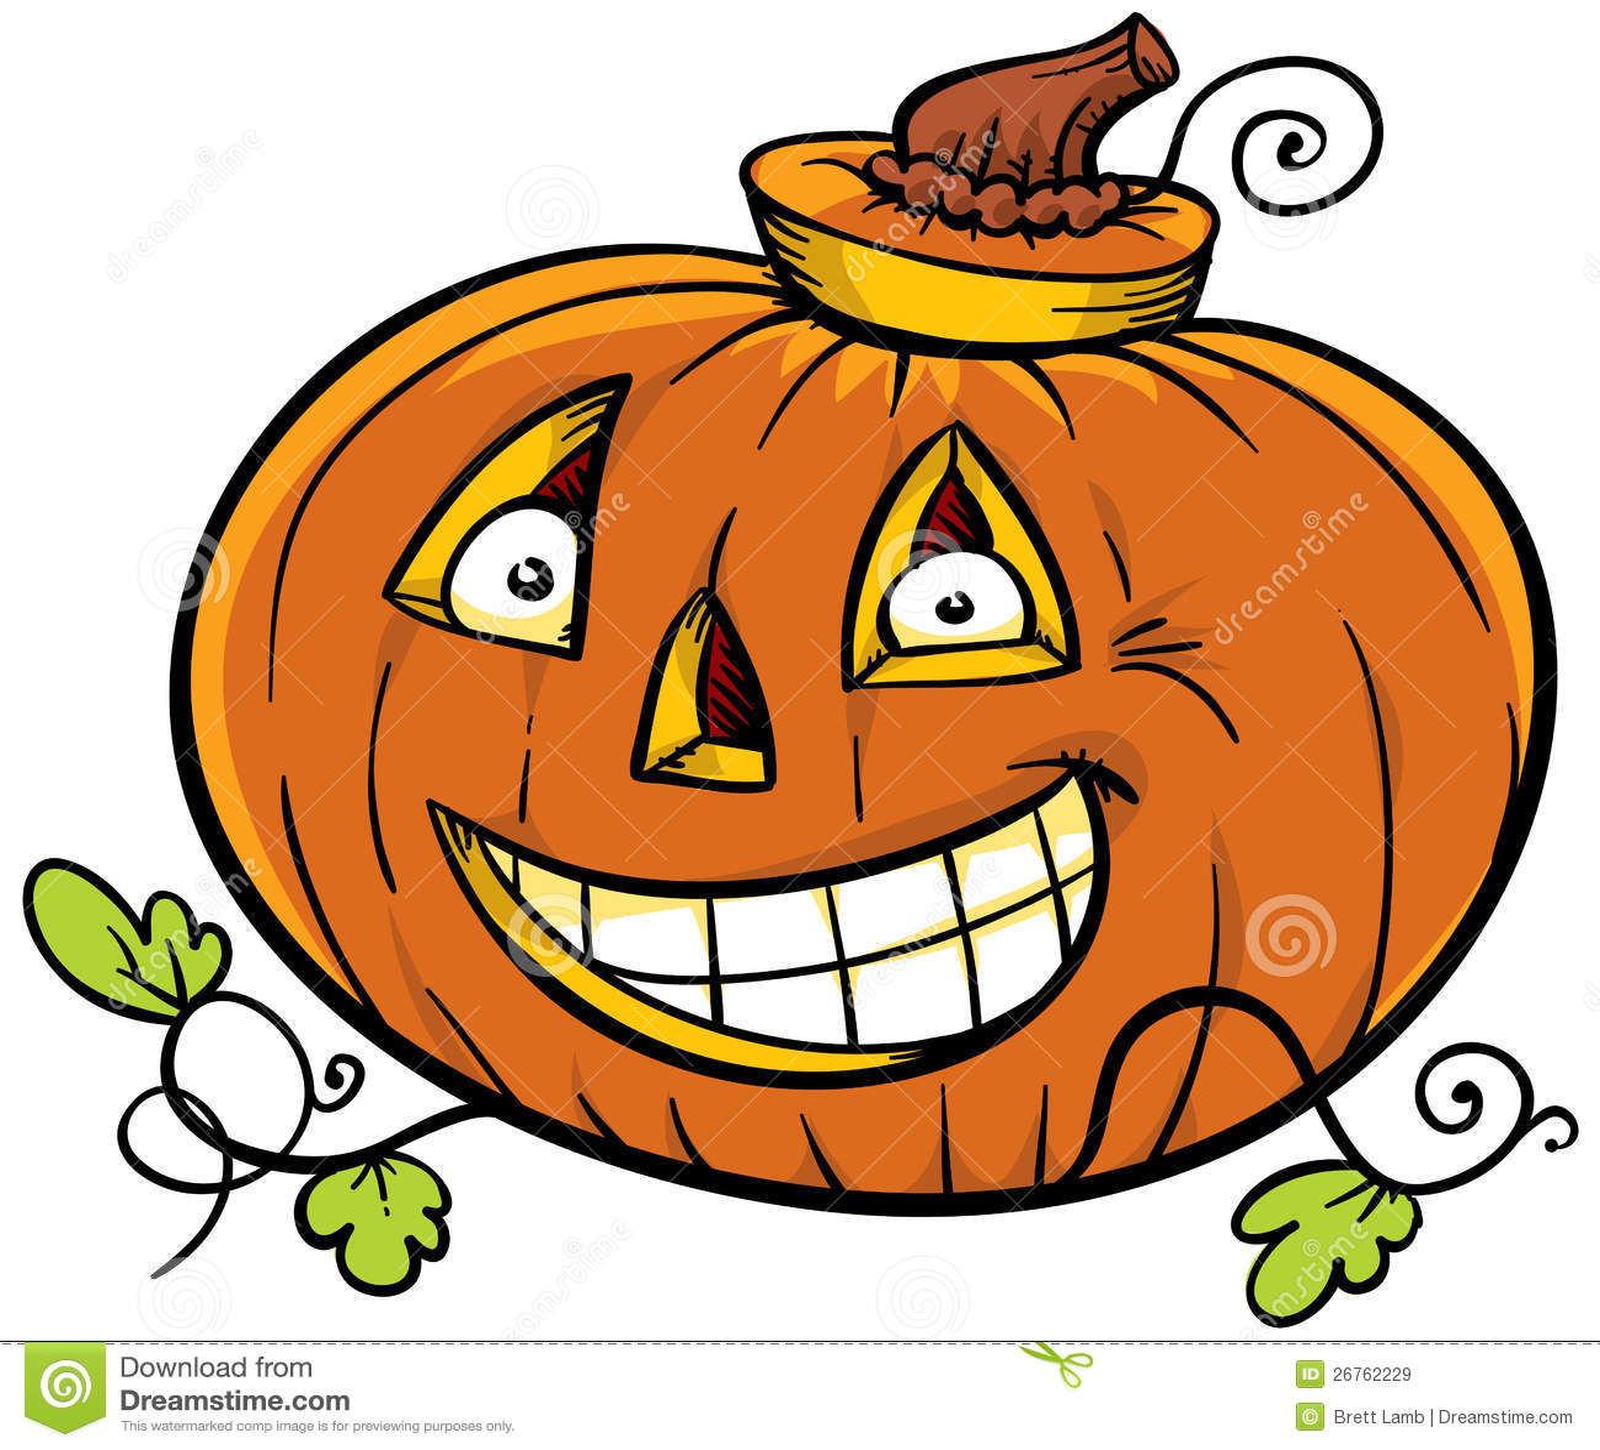 Cartoon Pumpkin Royalty Free Stock Images - Image: 26762229